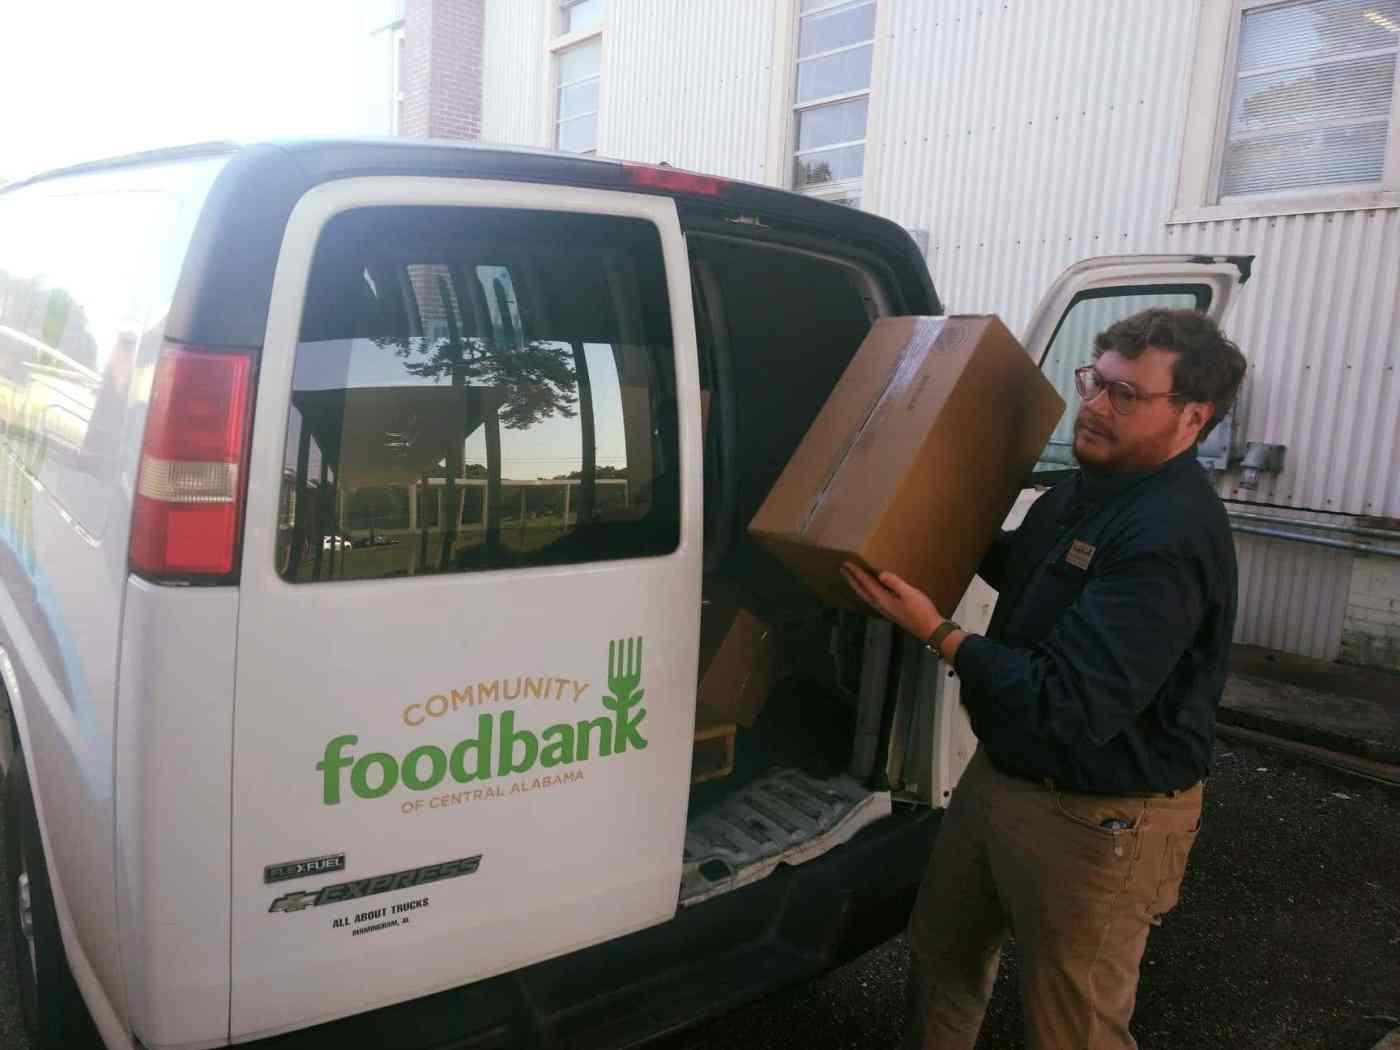 Birmingham, Community Food Bank of Central Alabama, donate, food drives, volunteer